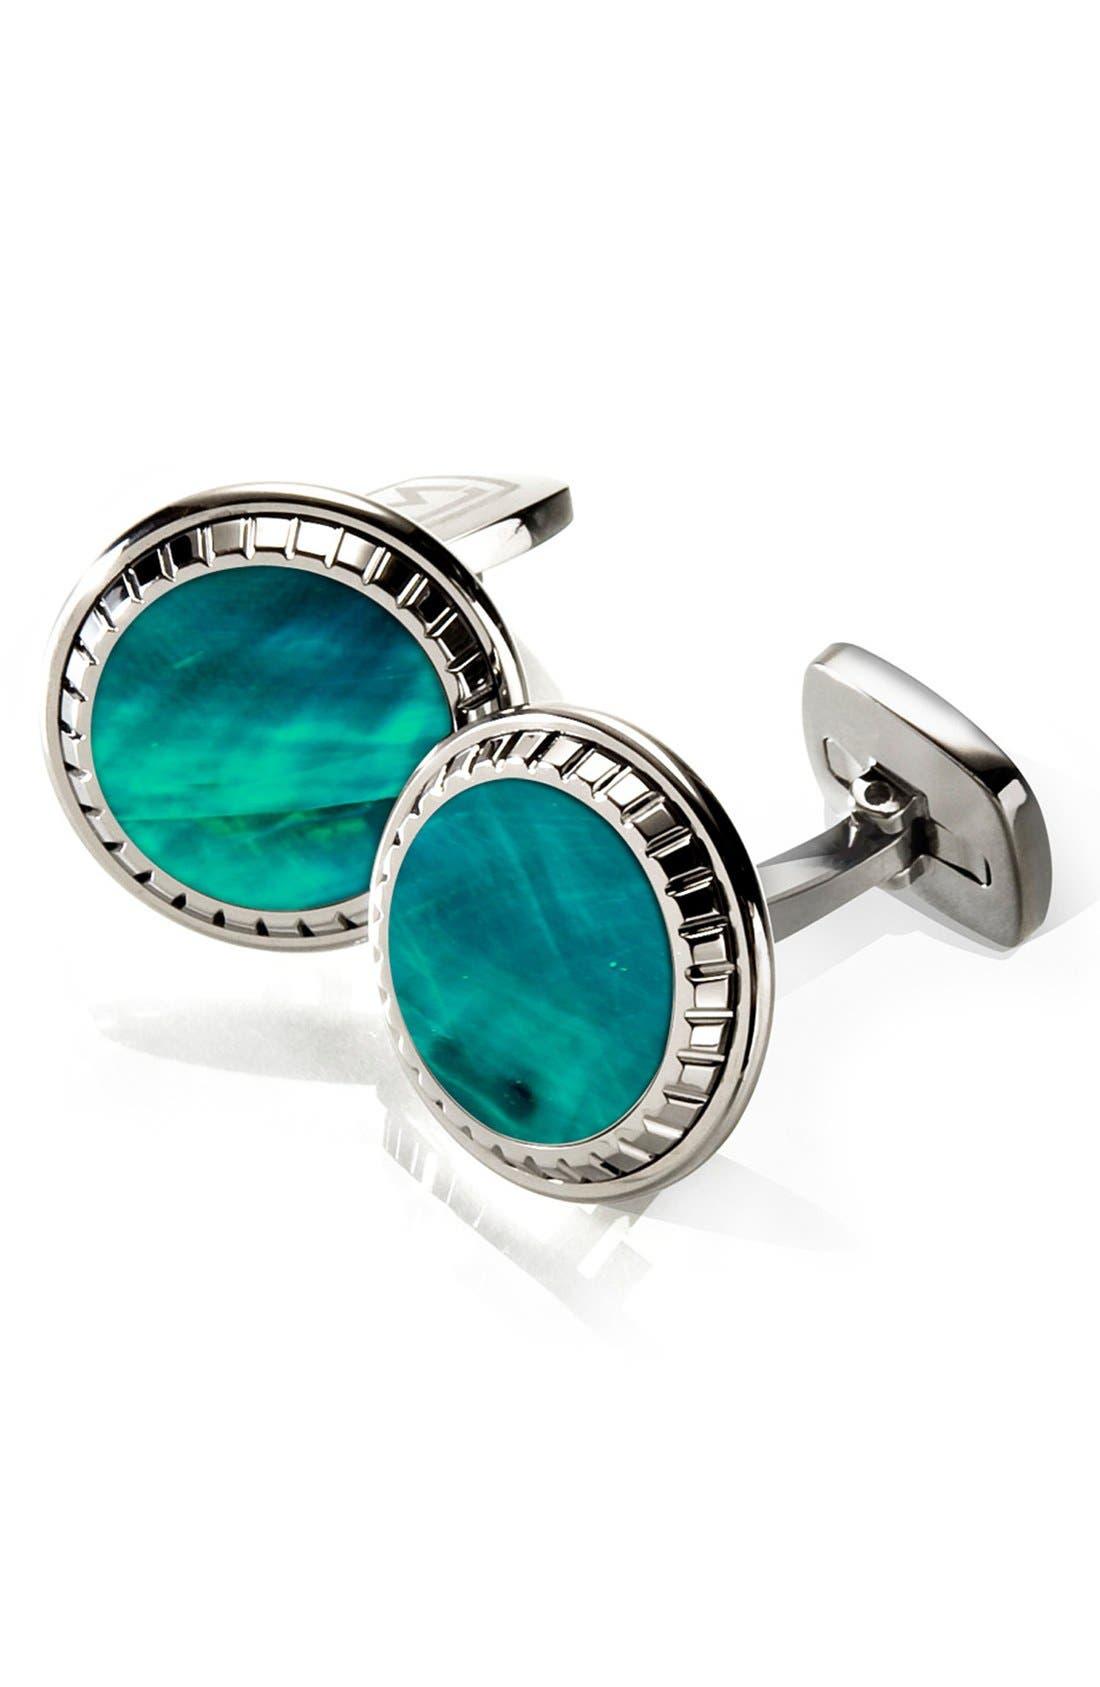 Main Image - M-Clip® Abalone Cuff Links